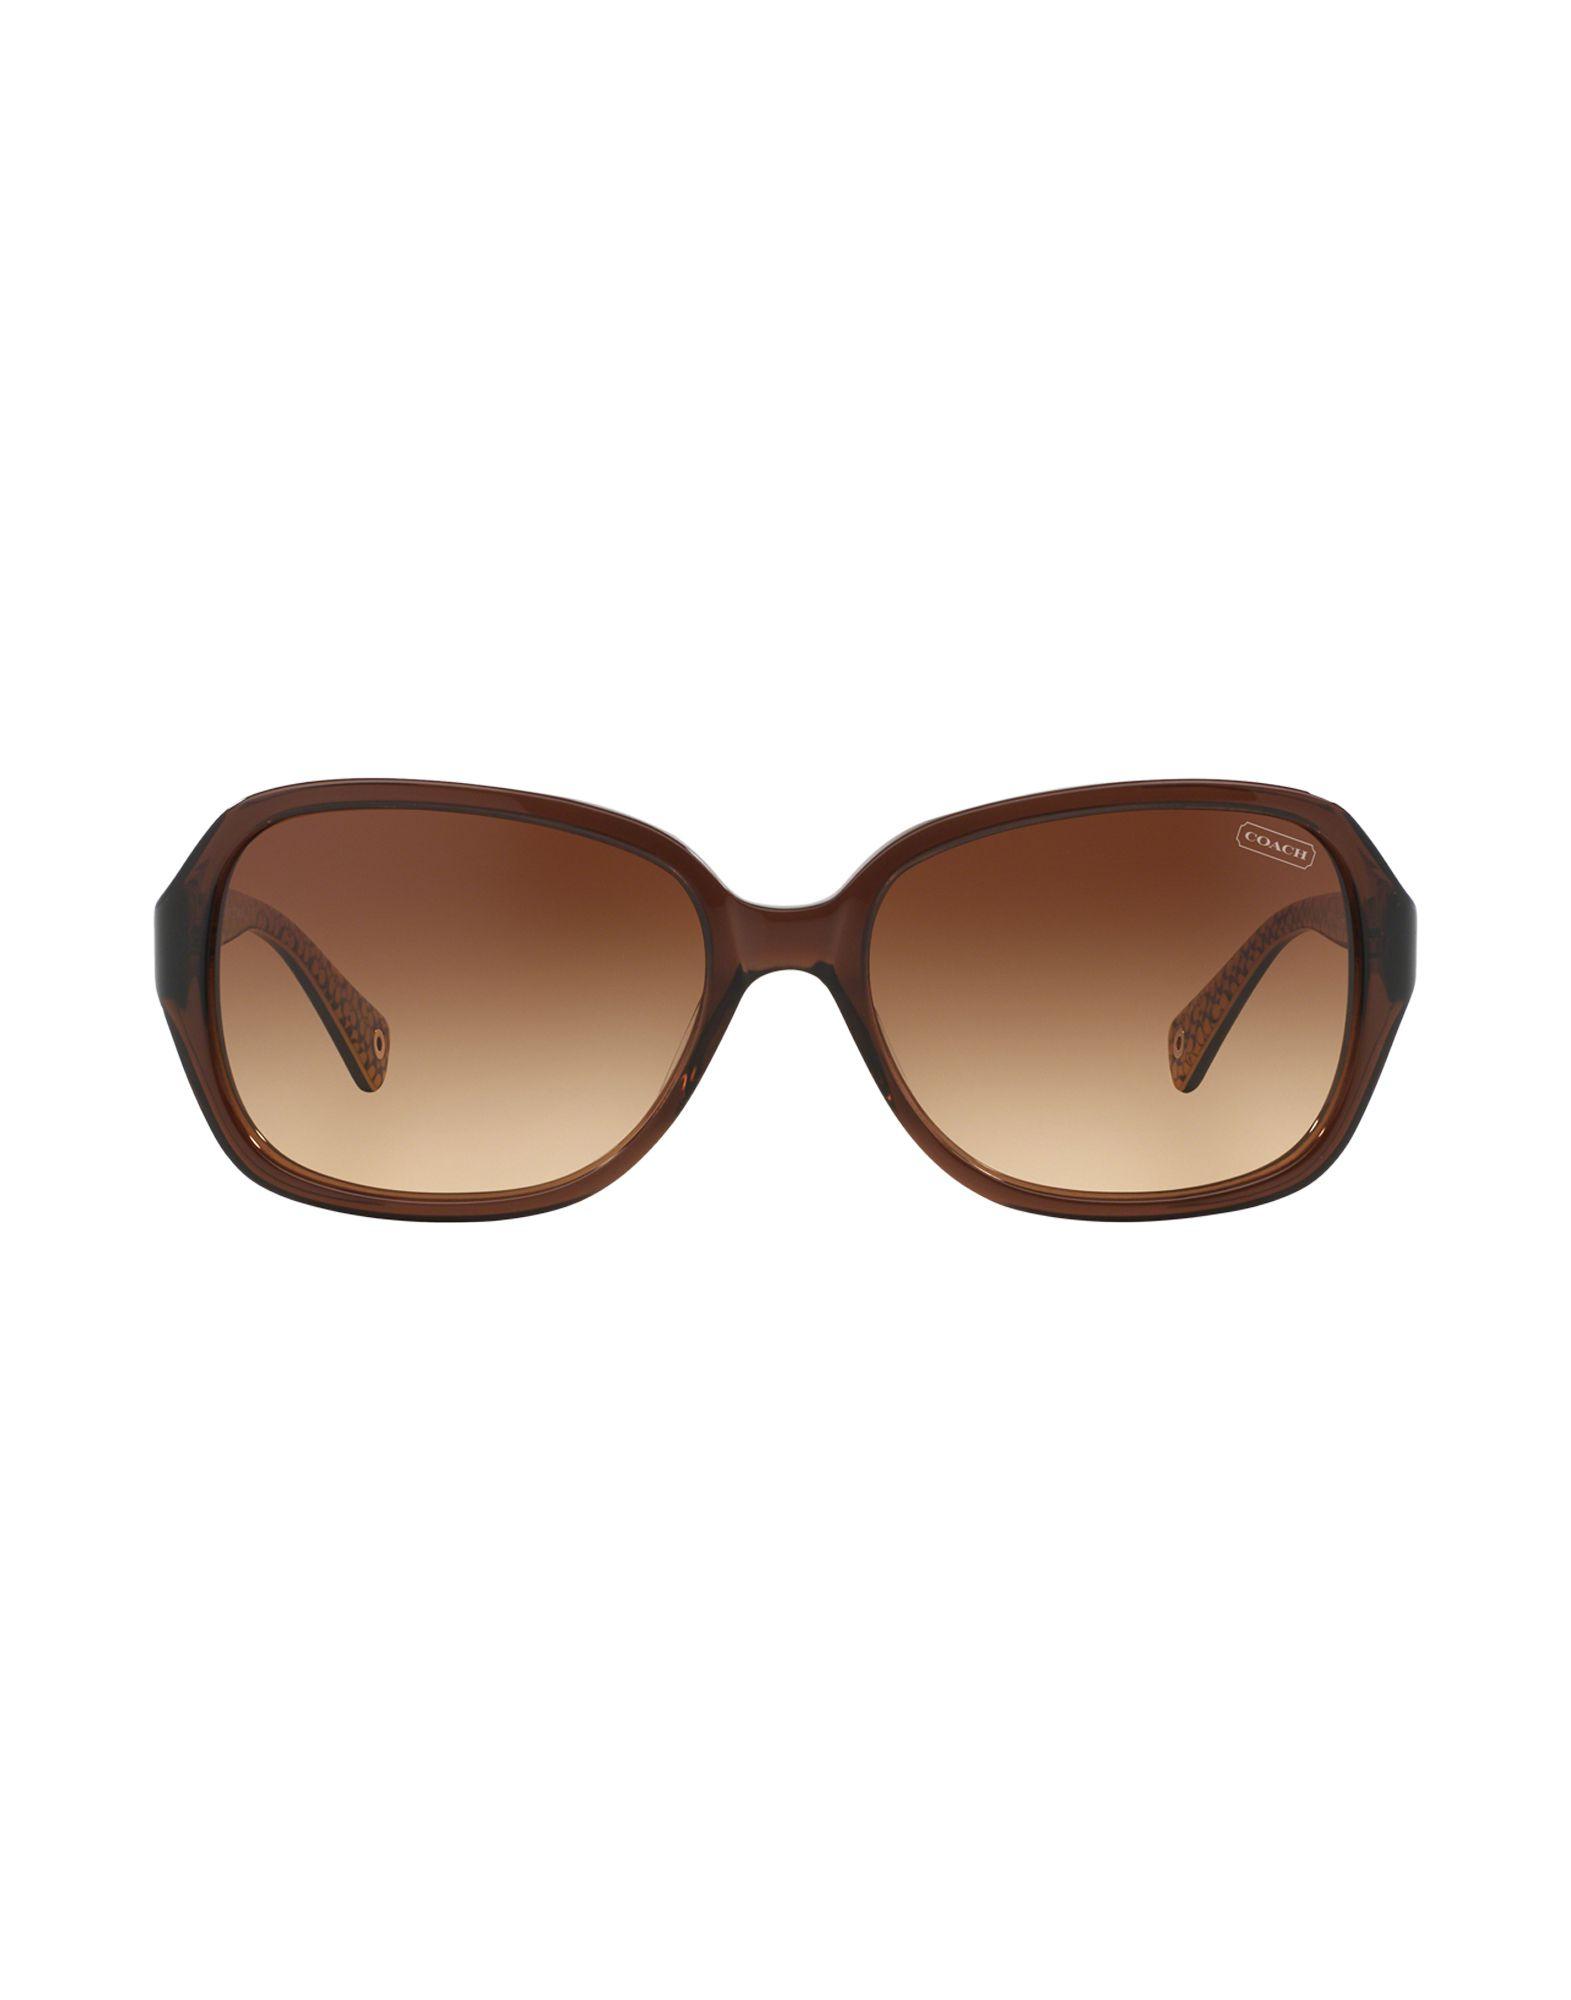 Coach Sunglasses in Brown - Lyst